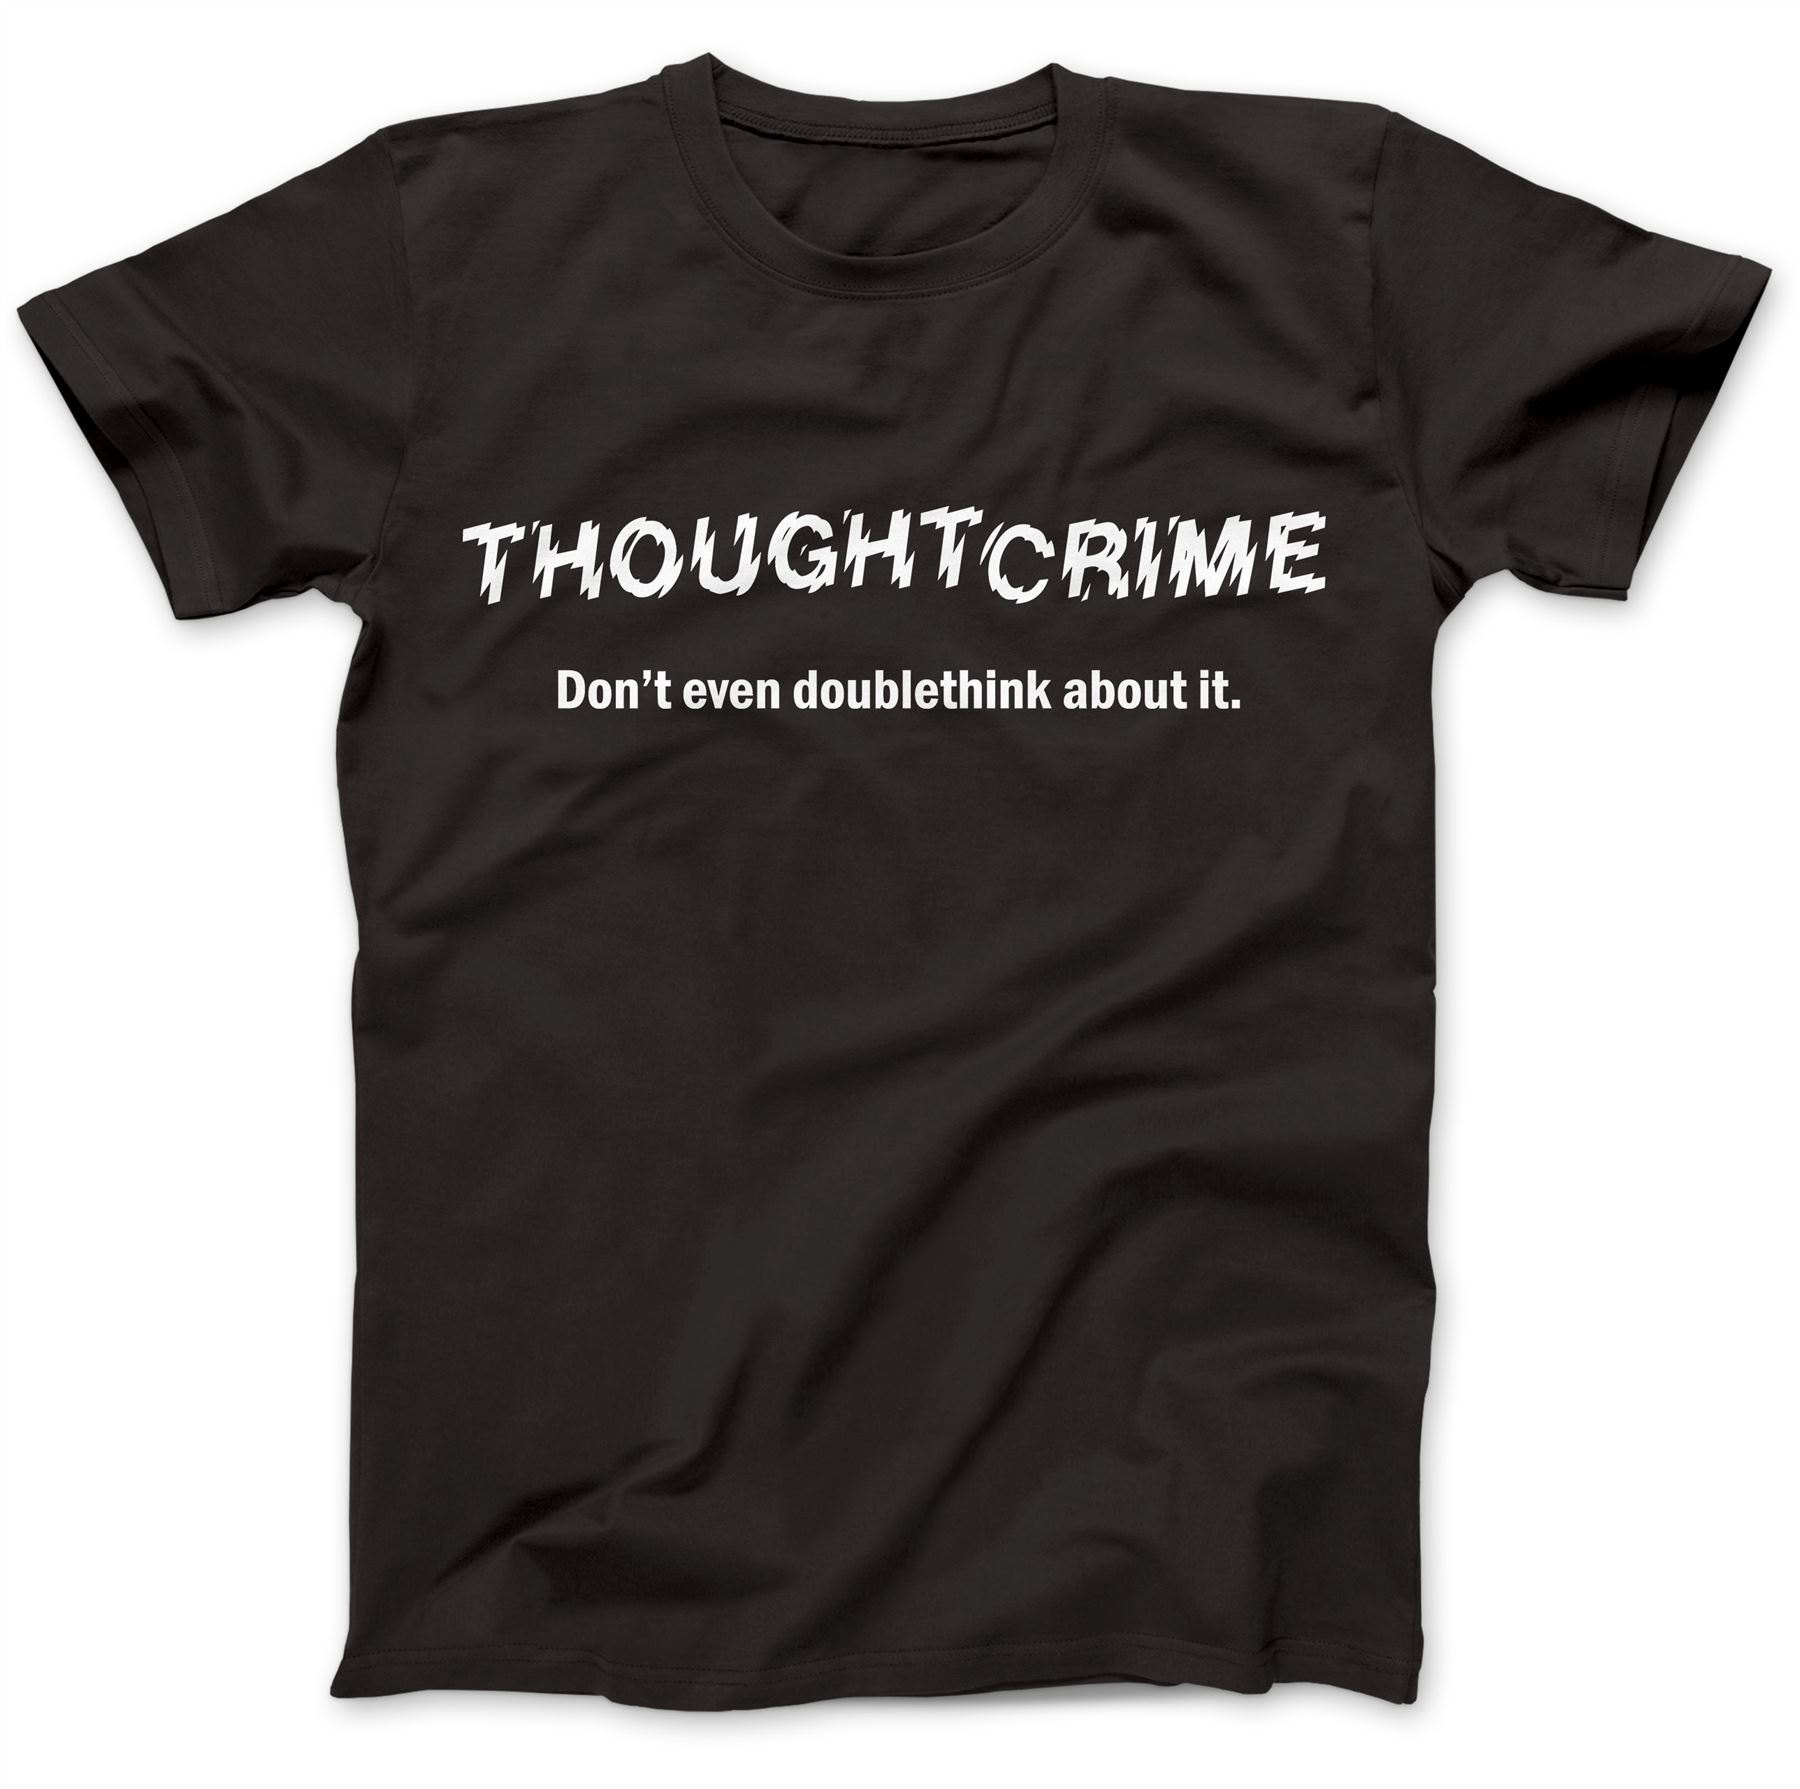 1984-Thought-Crime-George-Orwell-T-Shirt-100-Premium-Cotton-Animal-Farm miniatuur 5